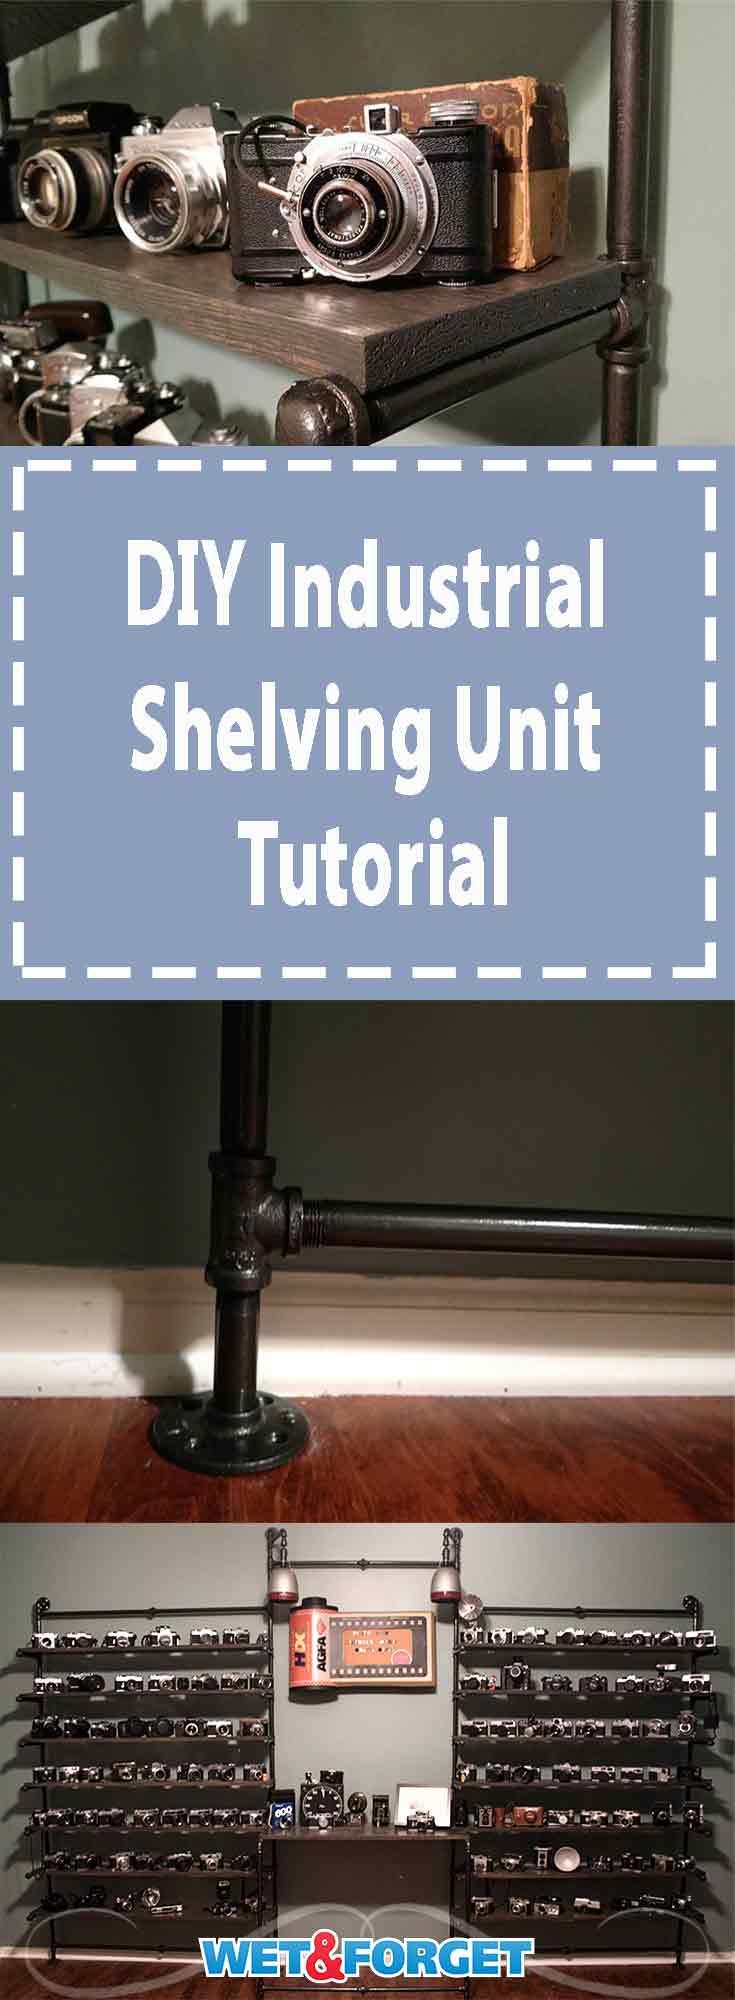 DIY Industrial Shelving Unit Tutorial